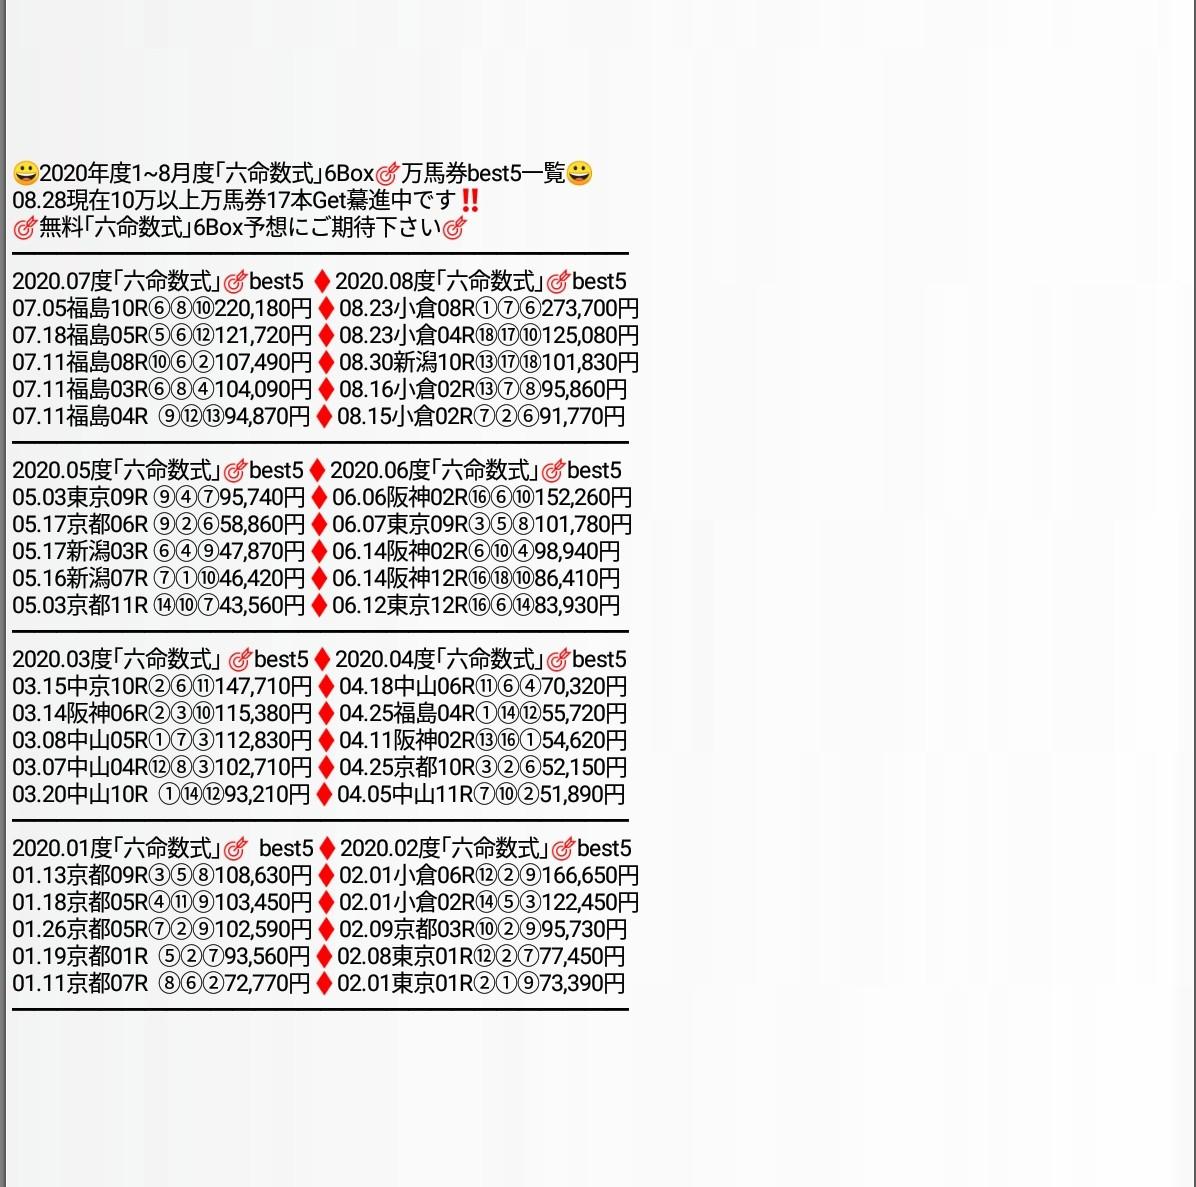 09.26中京10R馬単、三連単6頭Box .F予想公開09.26中京10R❶❷❸❹❺❻六命数.6馬番  ②③④⑤⑦⑧各軸馬単3点、三連単F12点⑧⇒④⑤⑦⇒②③④⑤⑦⑧④⇒③⑤⑦⇒②③④⑤⑦⑧⑤⇒③④⑦⇒②③④⑤⑦⑧⑦⇒④⑤⑧⇒②③④⑤⑦⑧他のレースはで販売中‼️